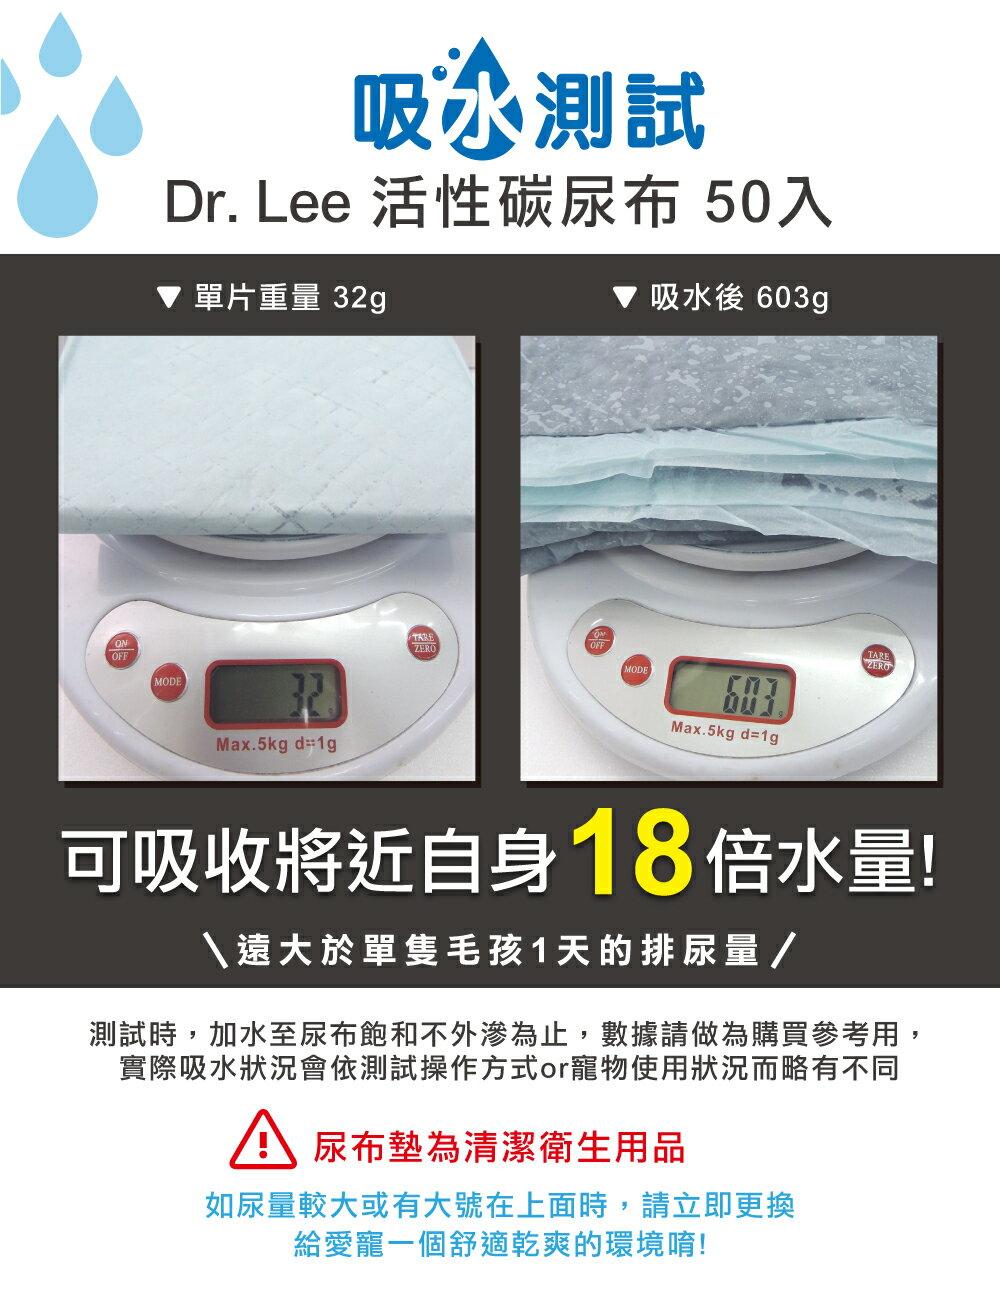 Dr. Lee 專業用活性碳尿布 寵物尿布墊  50入(45*60cm) 限3包內可超取(H003A12) 2